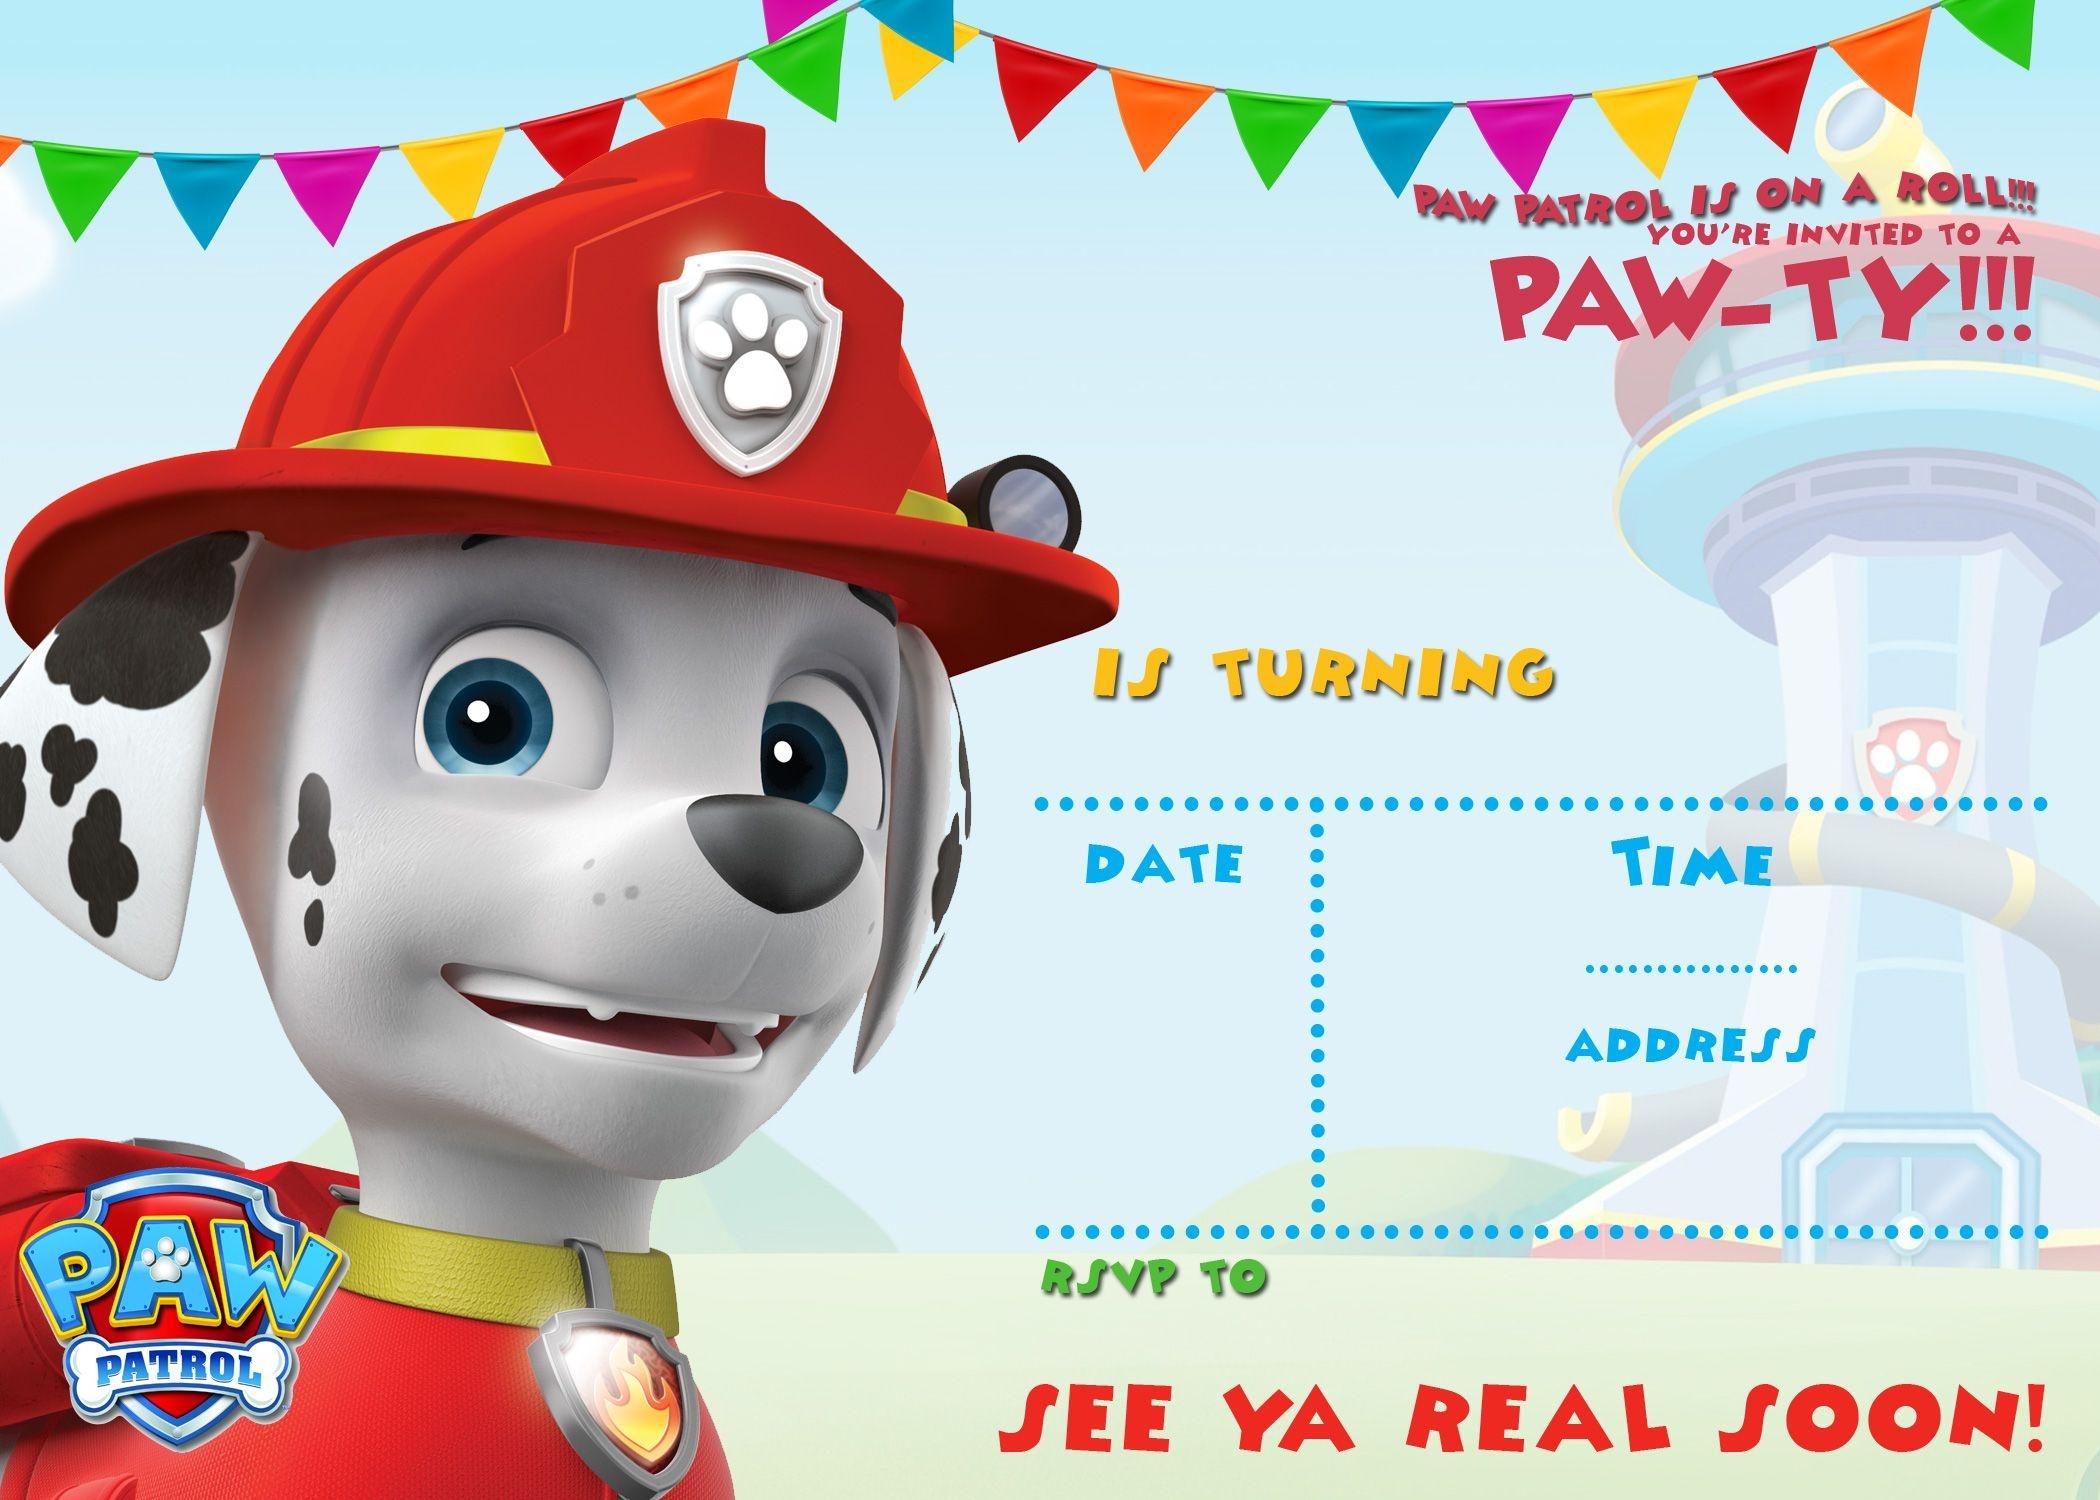 Free Printable Paw Patrol Invitation Template - All Characters | Paw - Free Printable Paw Patrol Invitations